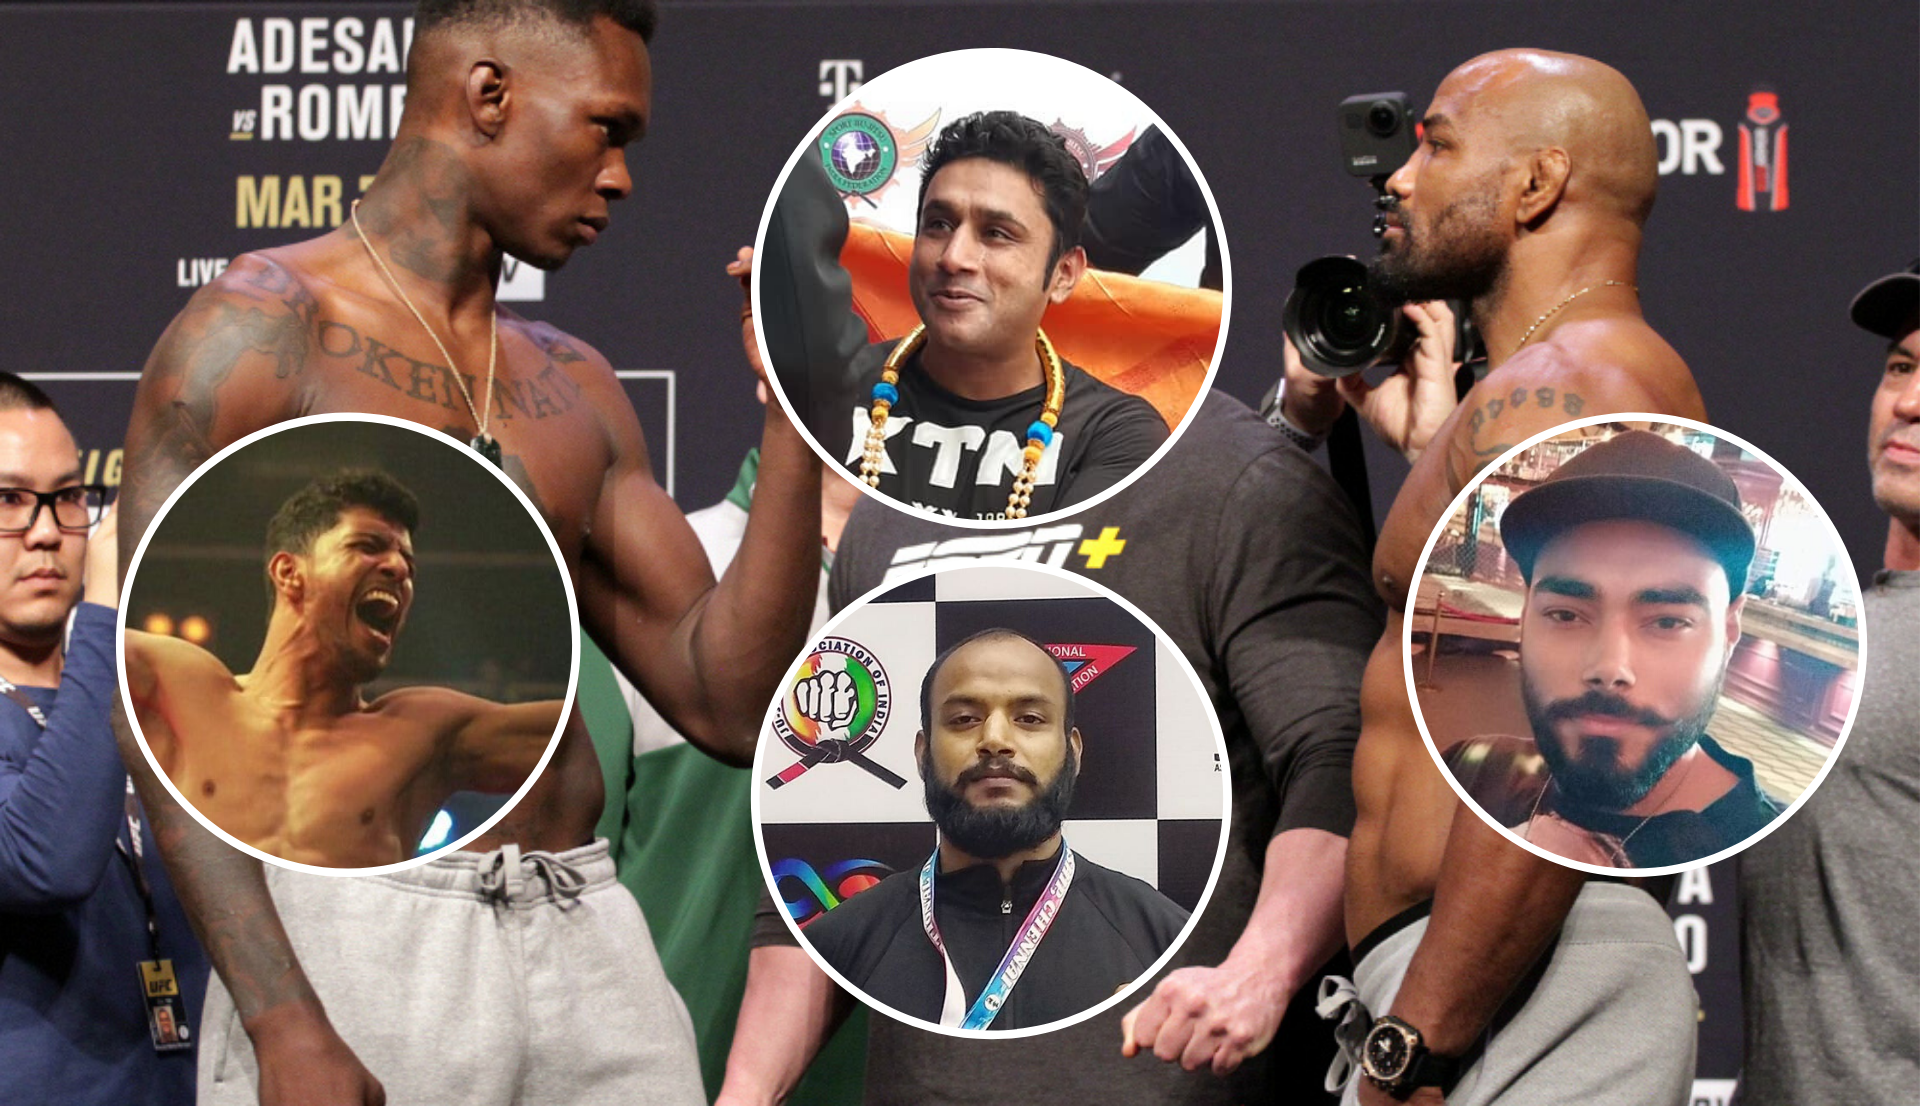 Indian MMA community give predictions for UFC 248: Adesanya vs Romero and Zhang vs Jedrzejczyk - Romero